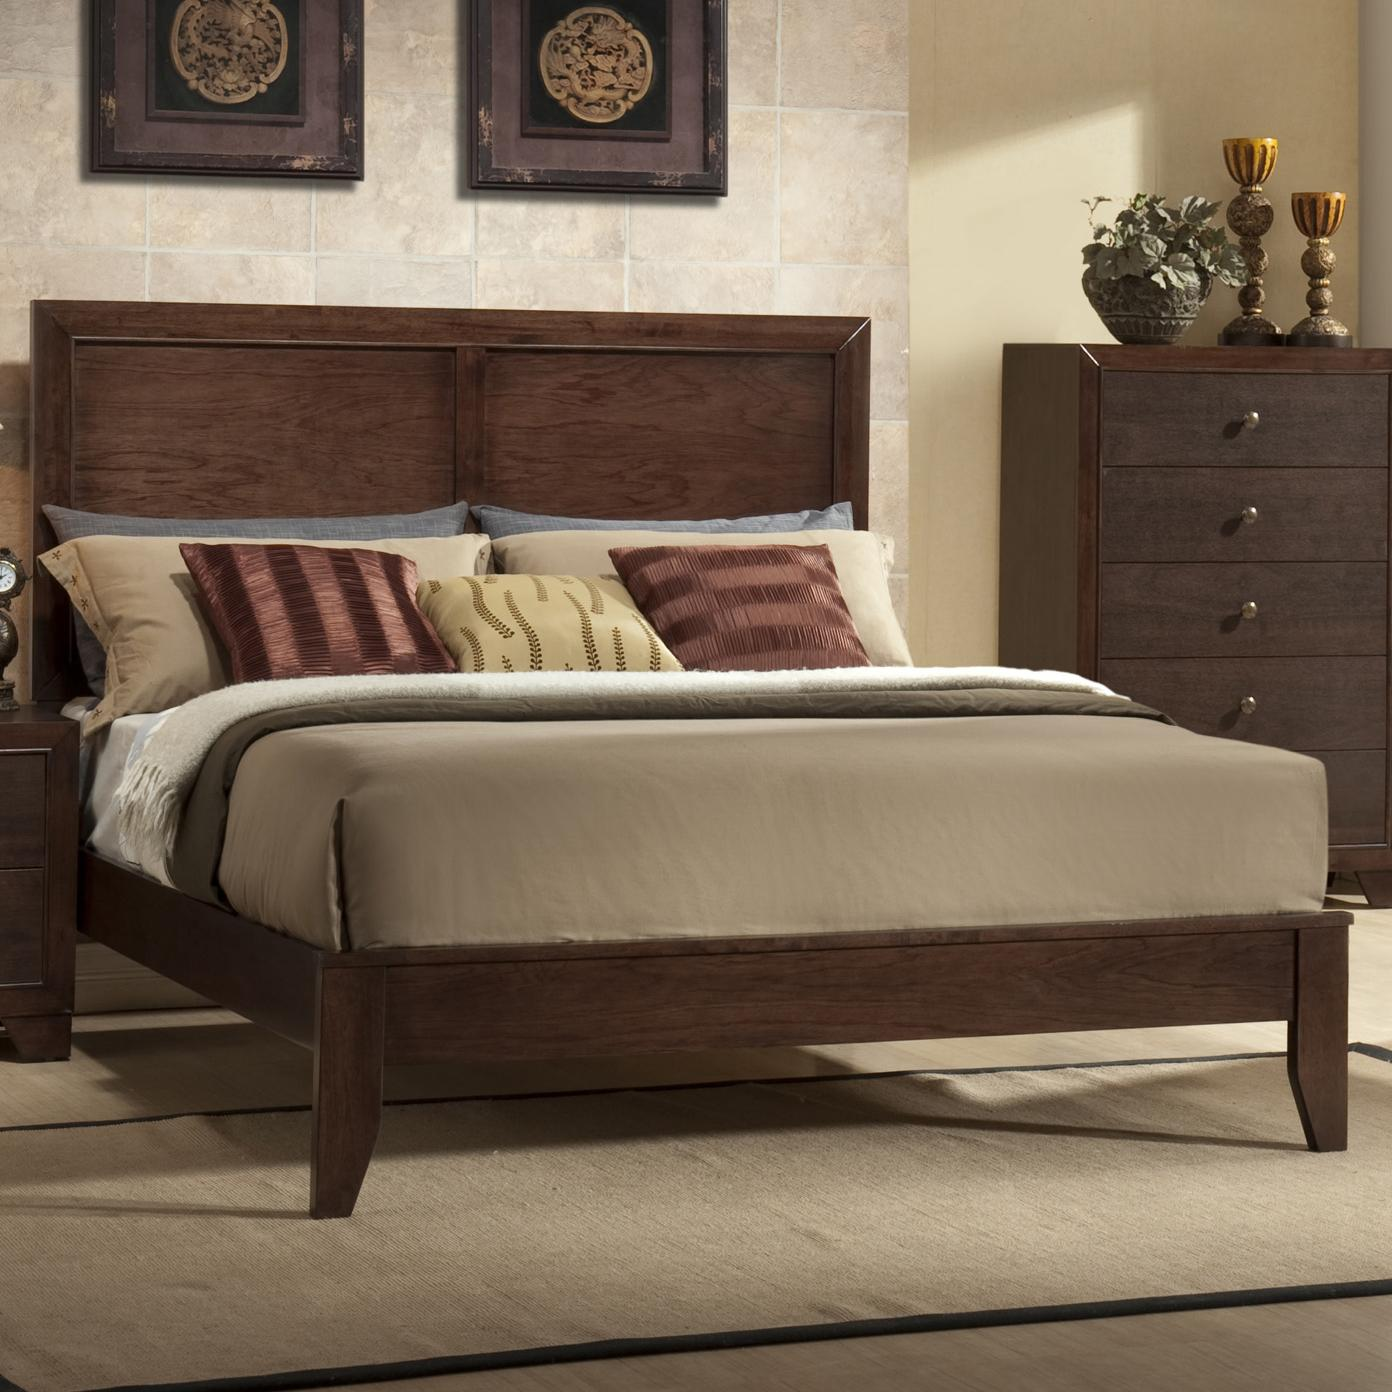 Crown Mark Silvia King Low Profile Bed - Item Number: B4600-K-HBFB+RAIL